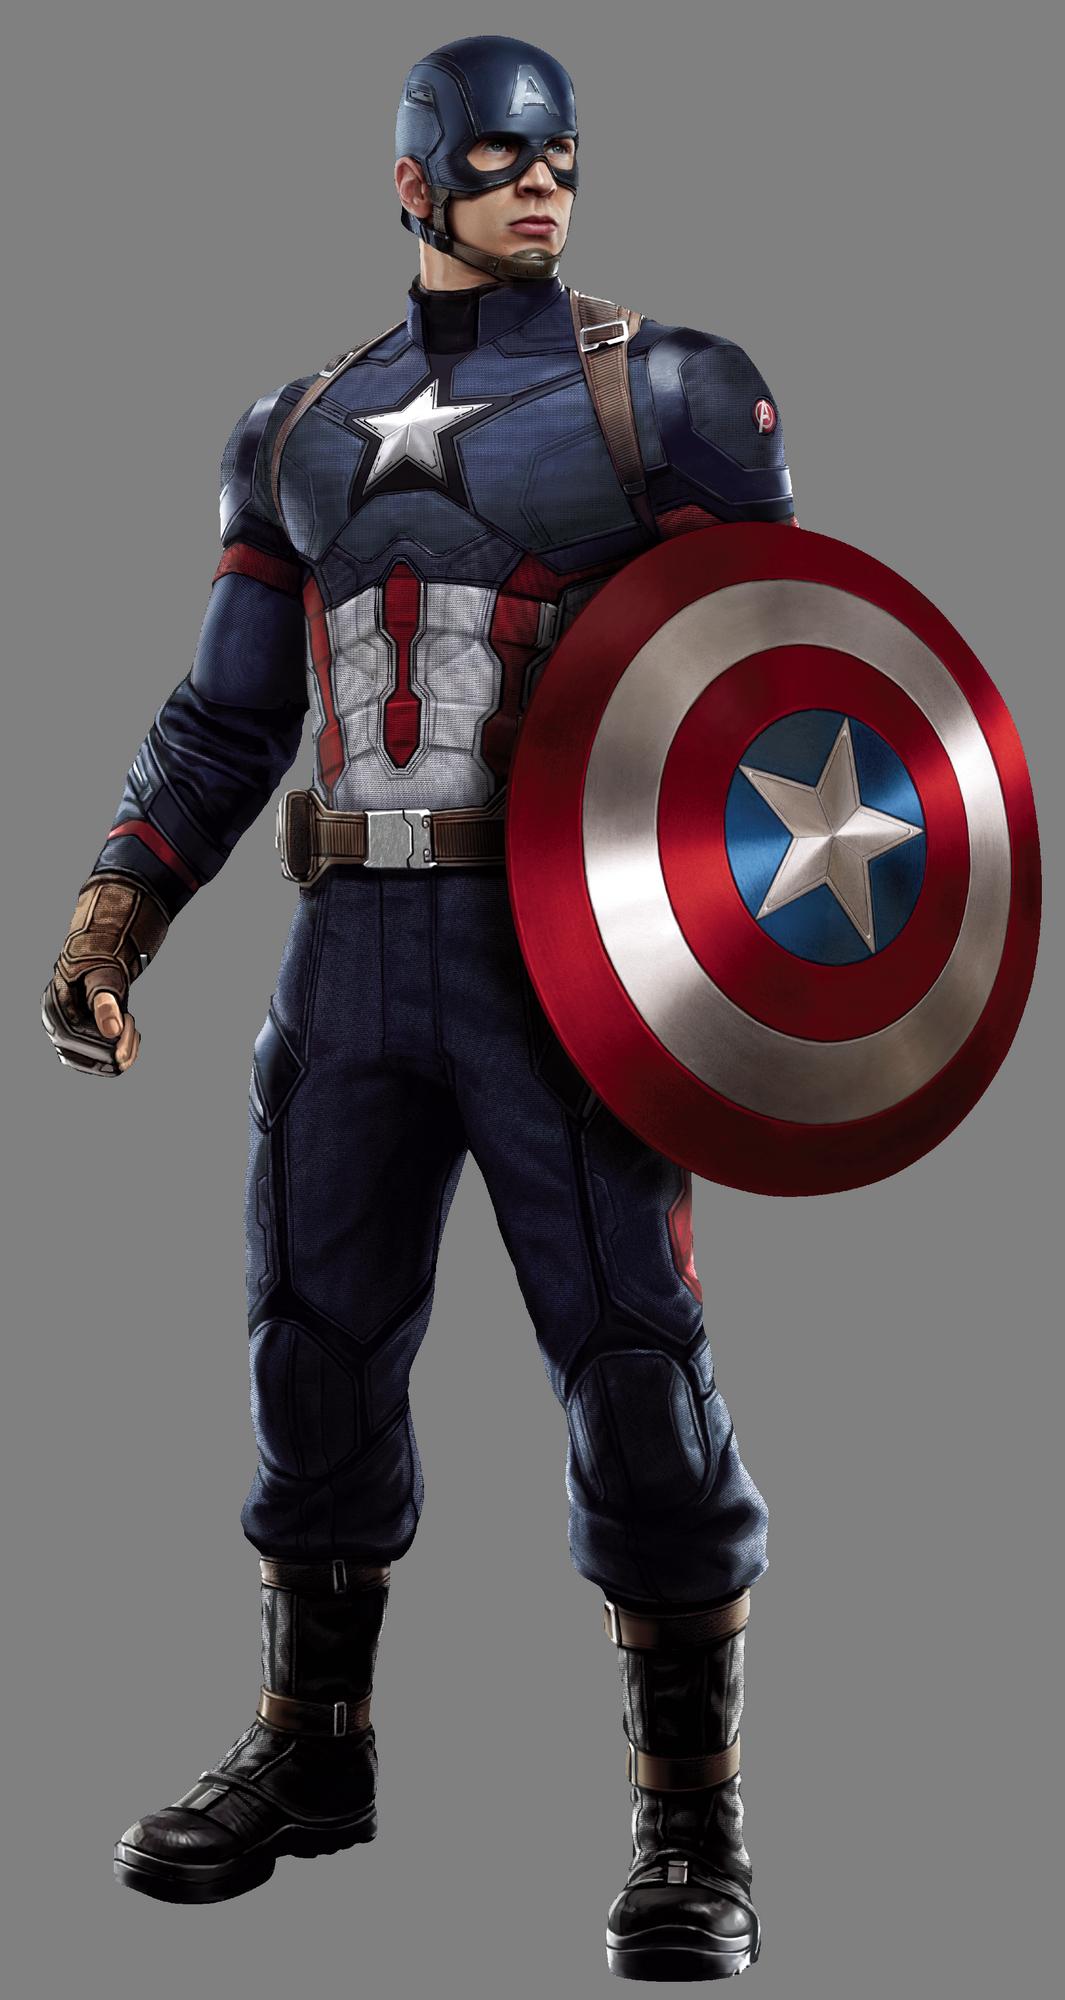 Captain America Png Image Captain America Cosplay Captain America Costume Captain America